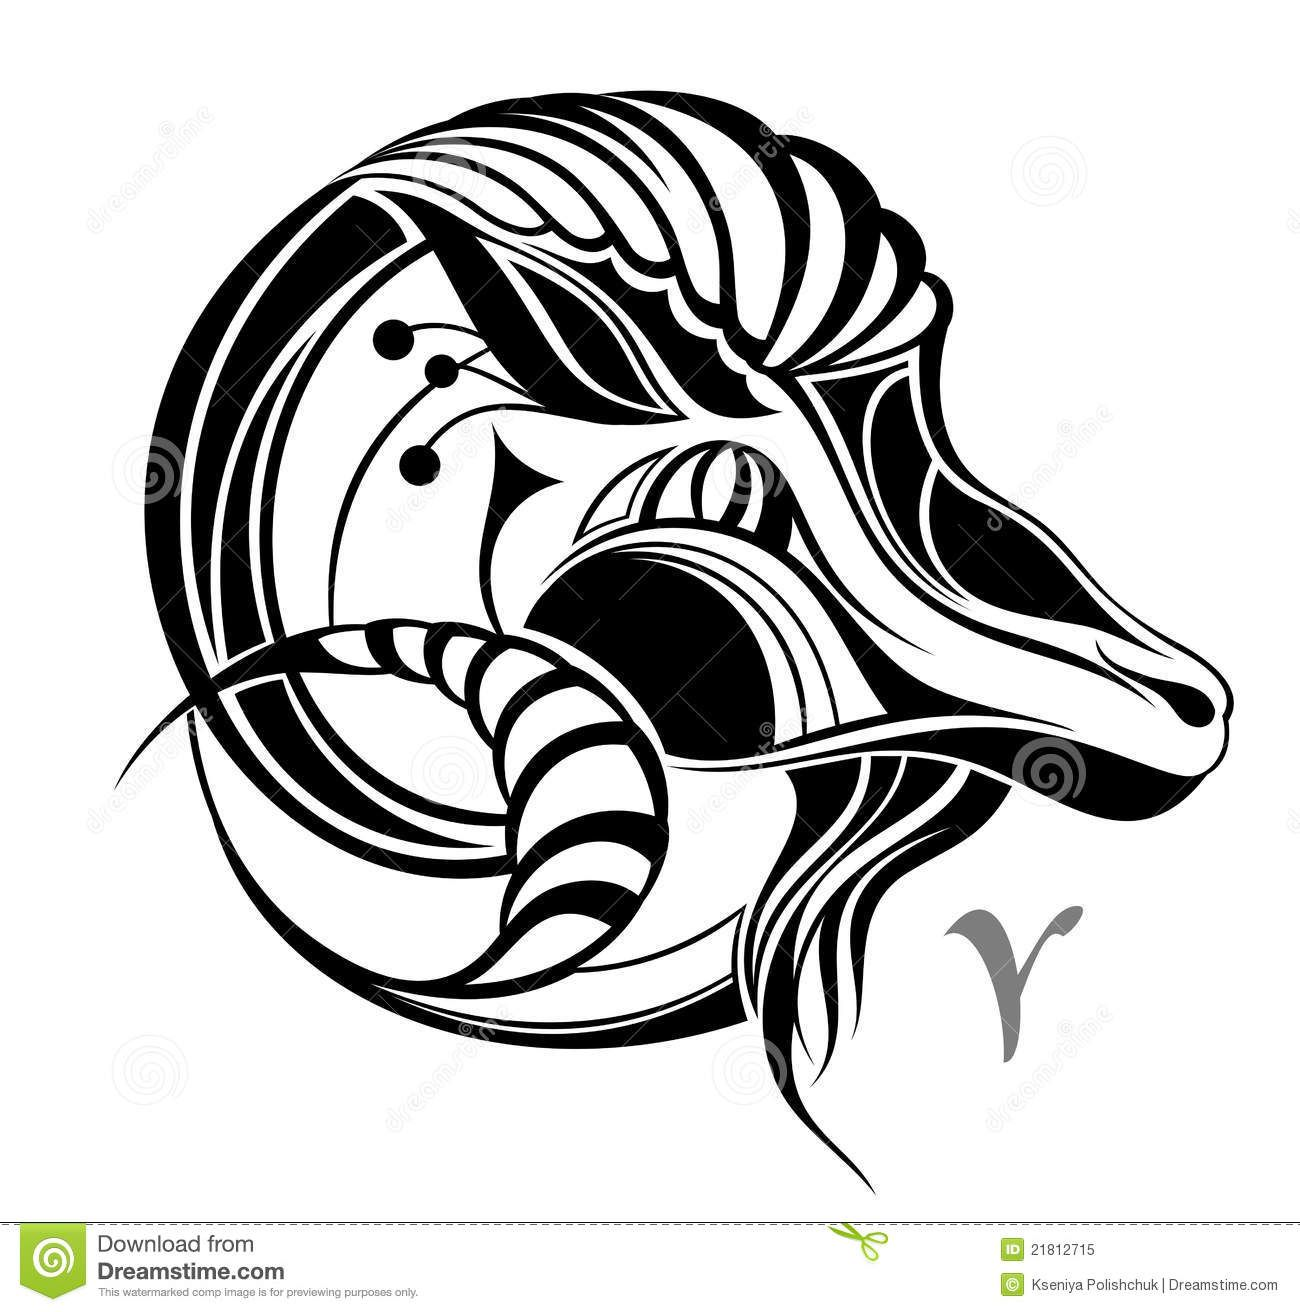 Symbol tattoo zodiac astrology horoscope sign aries virgo and symbol tattoo zodiac astrology horoscope sign aries biocorpaavc